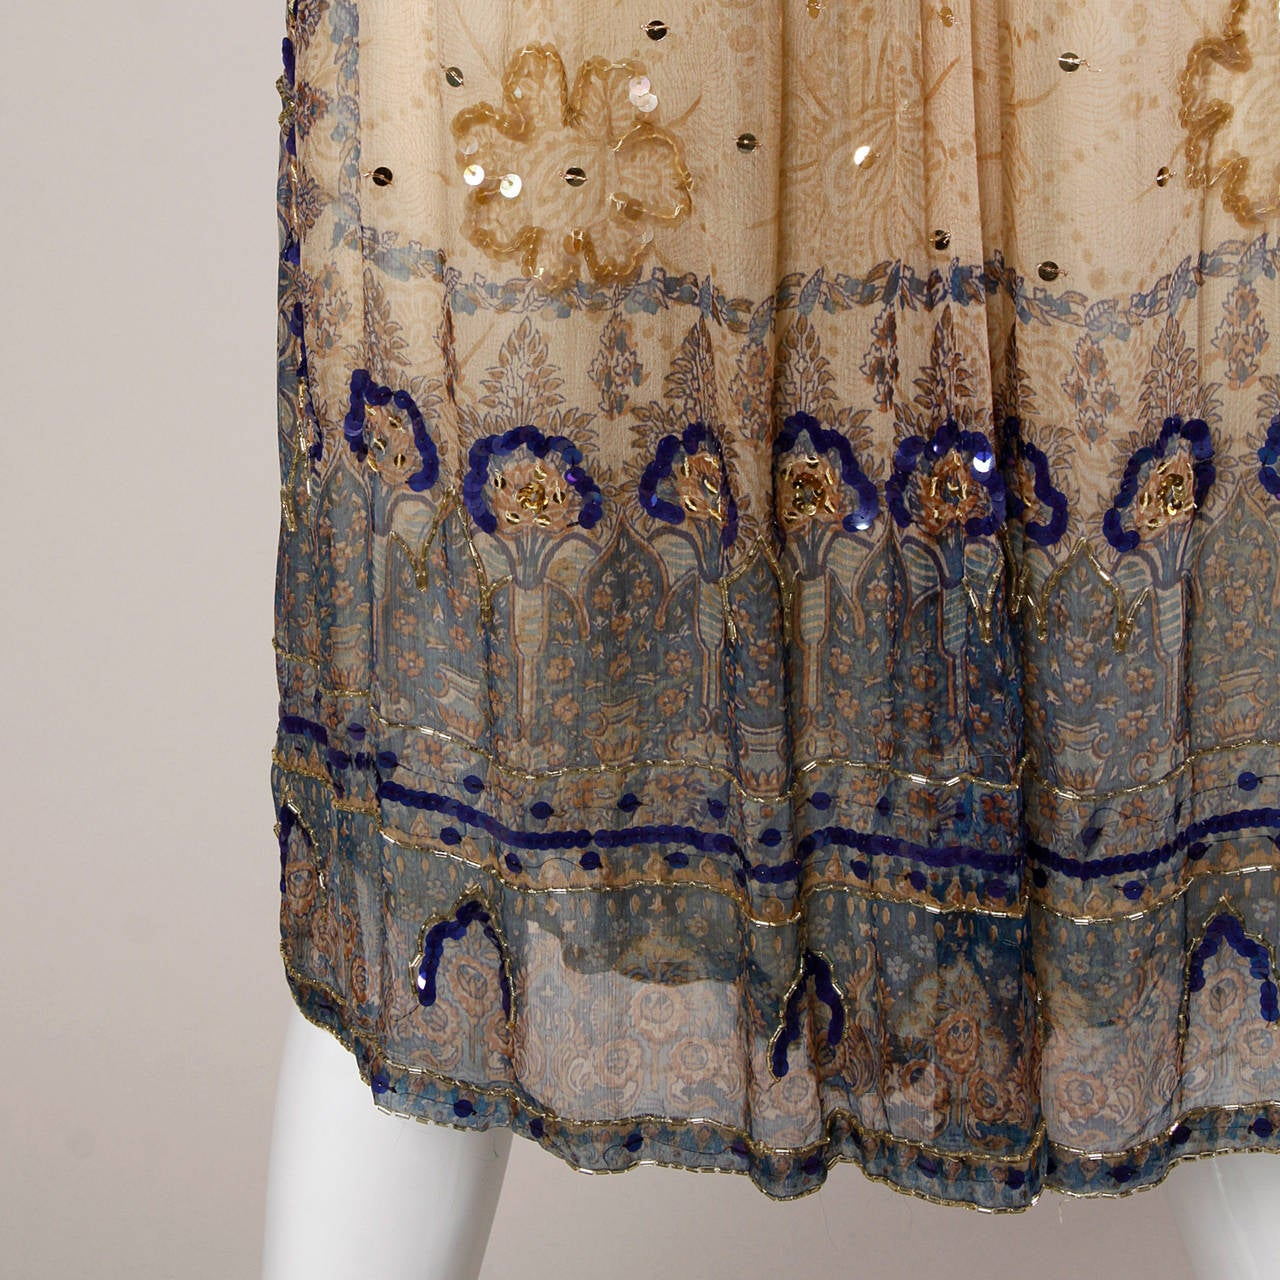 Judith Ann for Bullock's Wilshire Vintage 1970s Silk India Print Dress 7